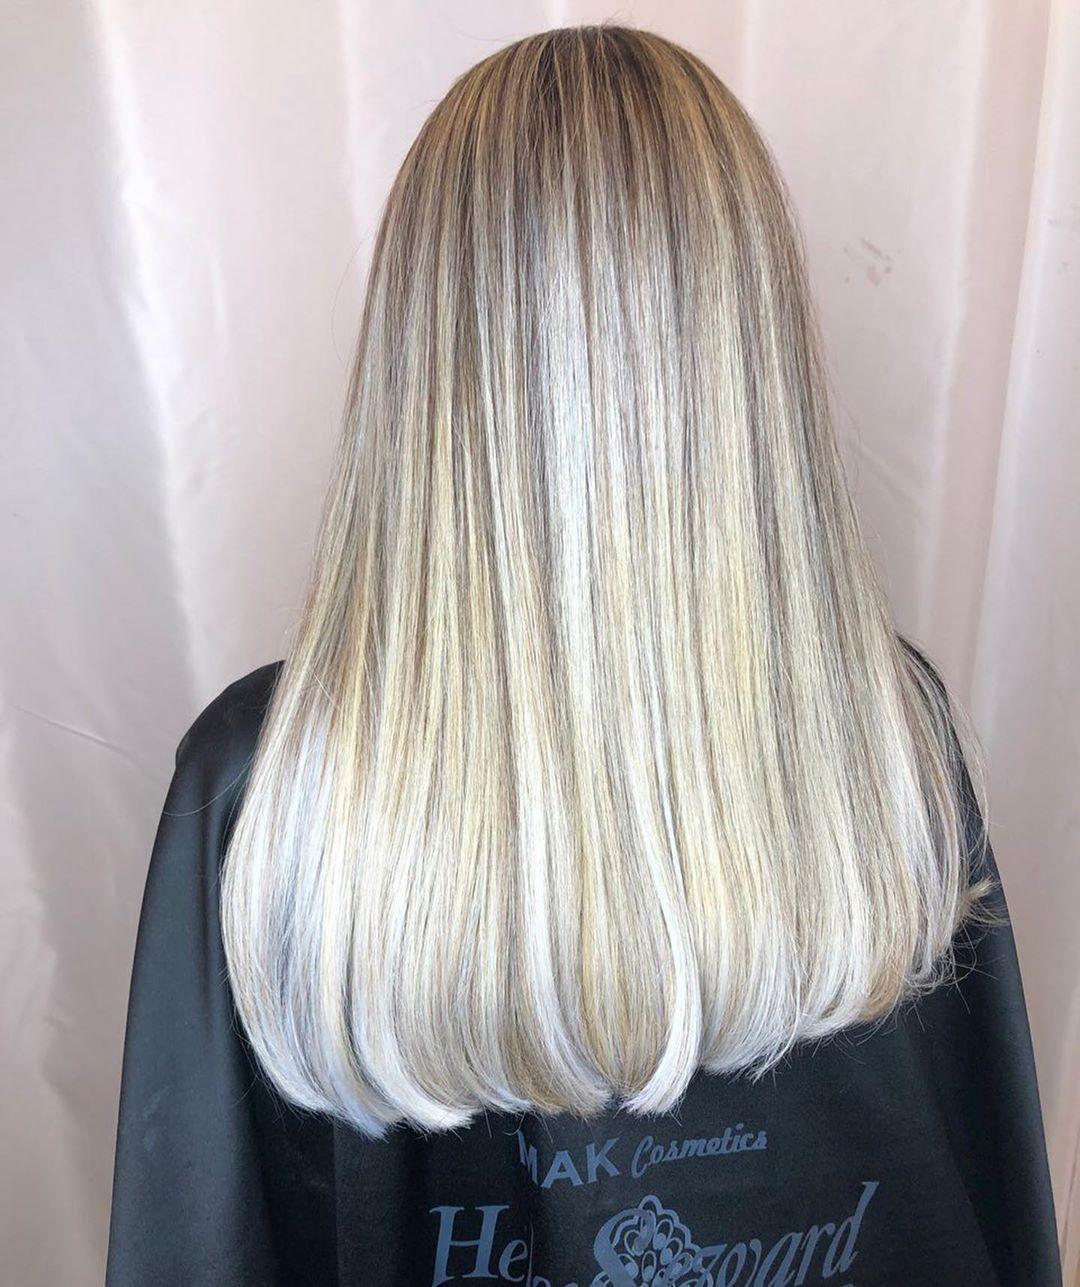 Hair Art Shatir Hapje Organike Pa Deme Eja Dhe Ti Shkelqe Per Ditet E Vecanta Per Termine Instagram Fashion Usa Fashion Beautiful Photography